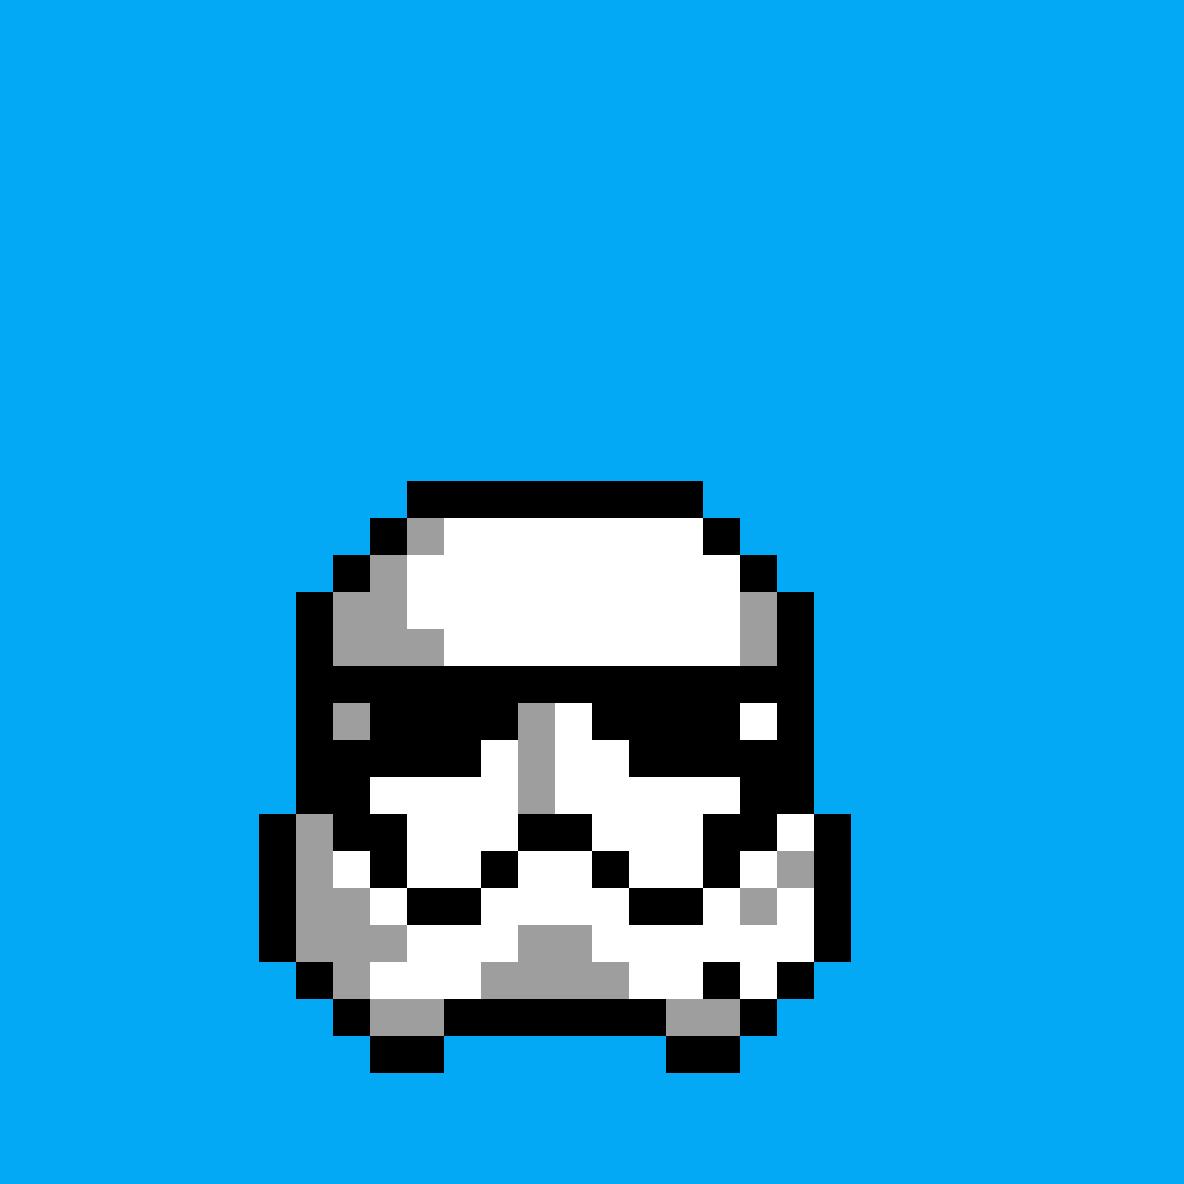 Pixilart Stormtrooper Pixel Art By Kaio Romanini